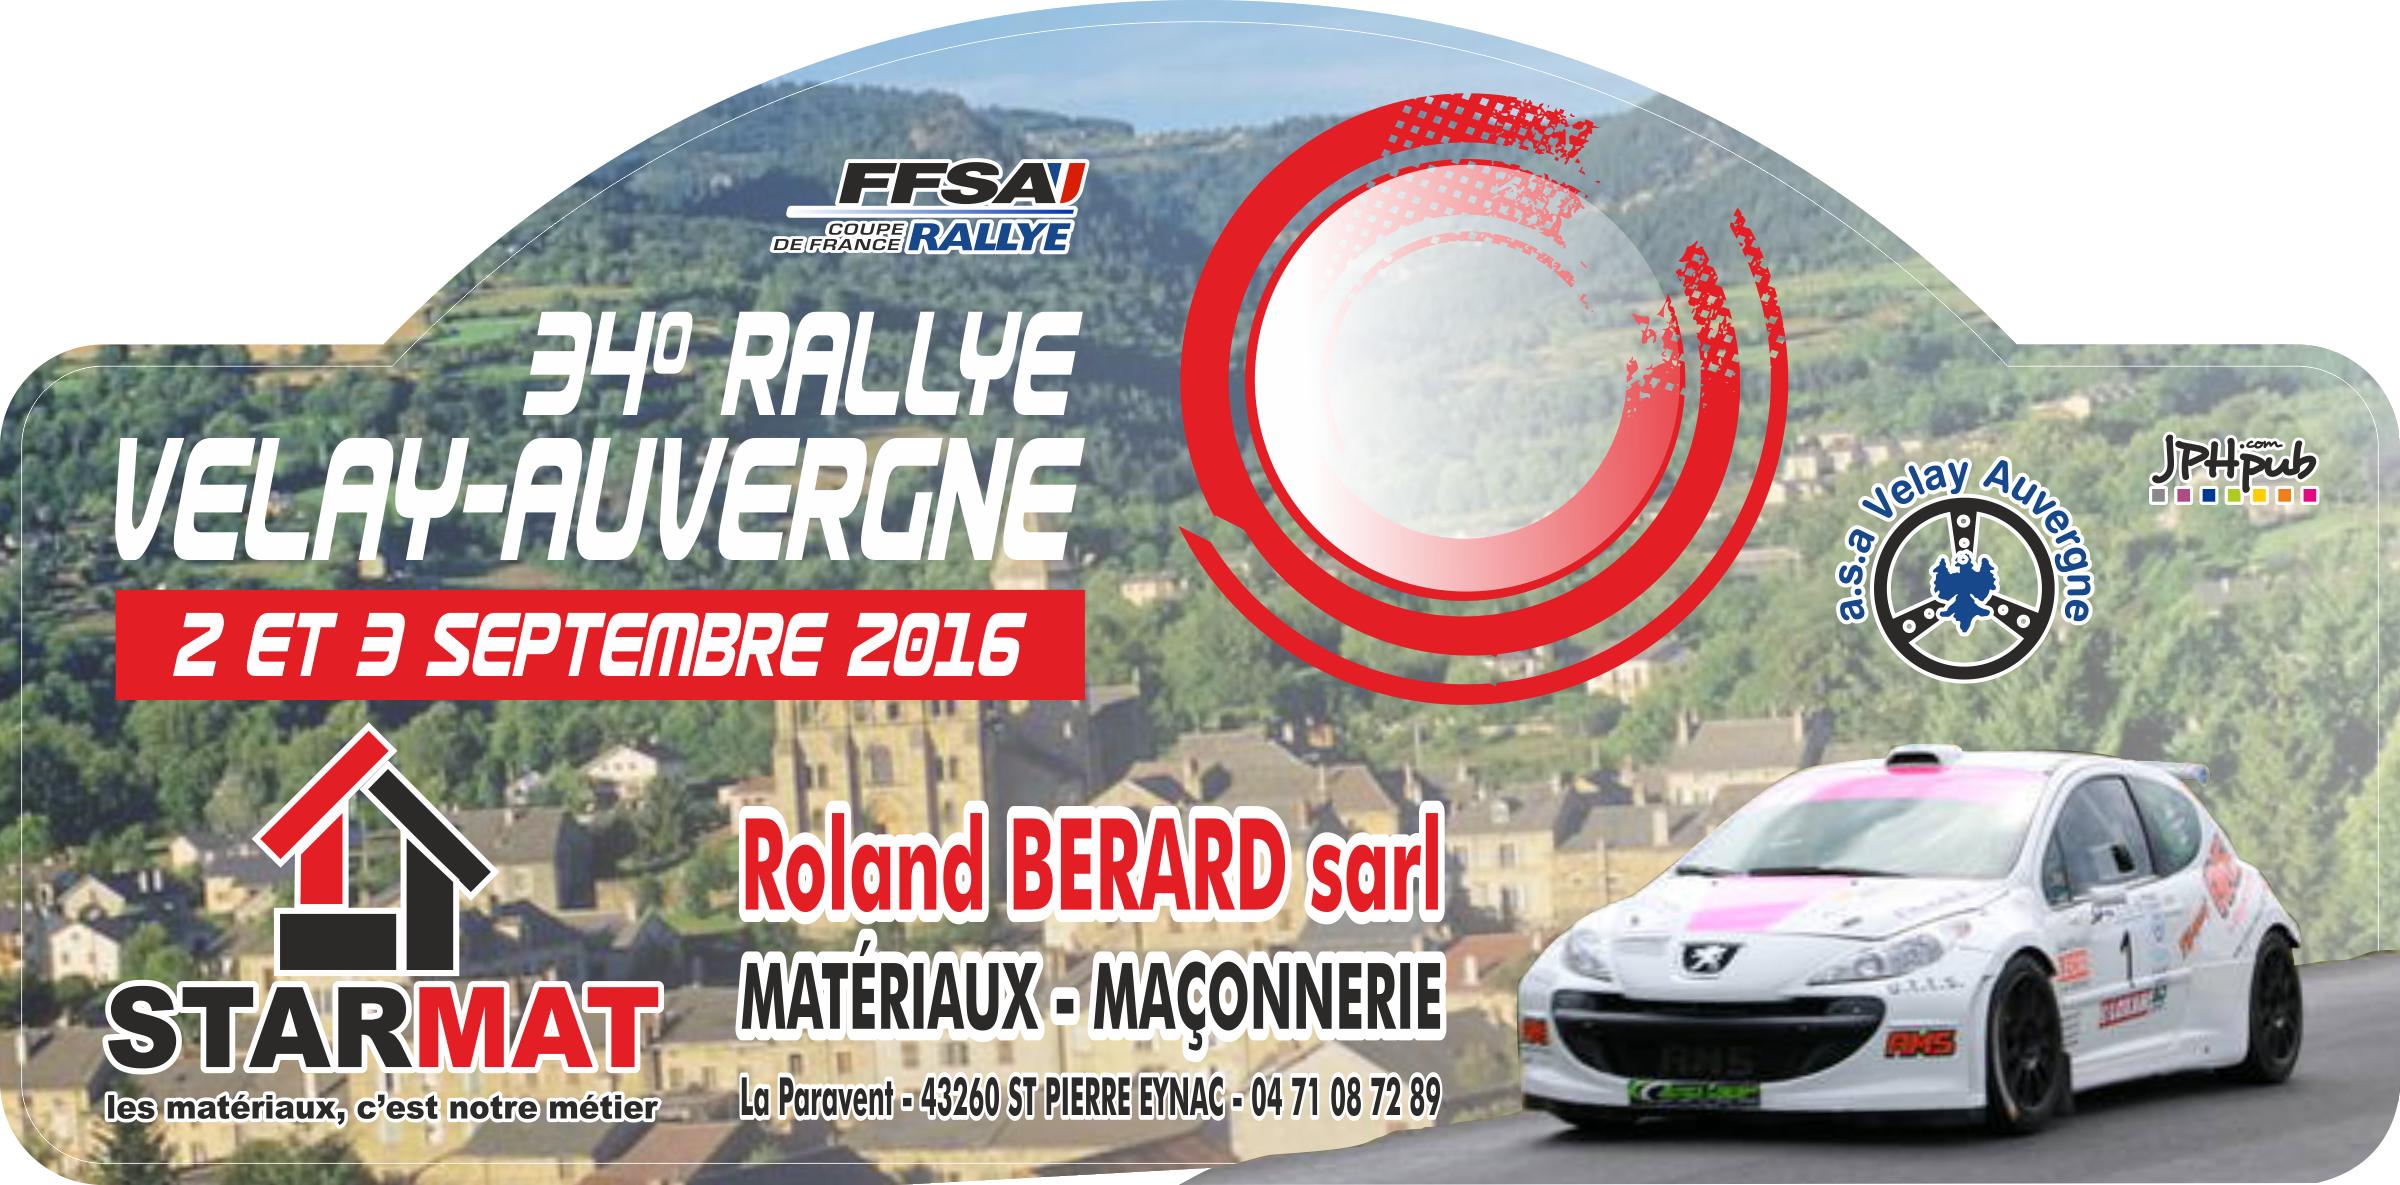 Rallye velay auvergne